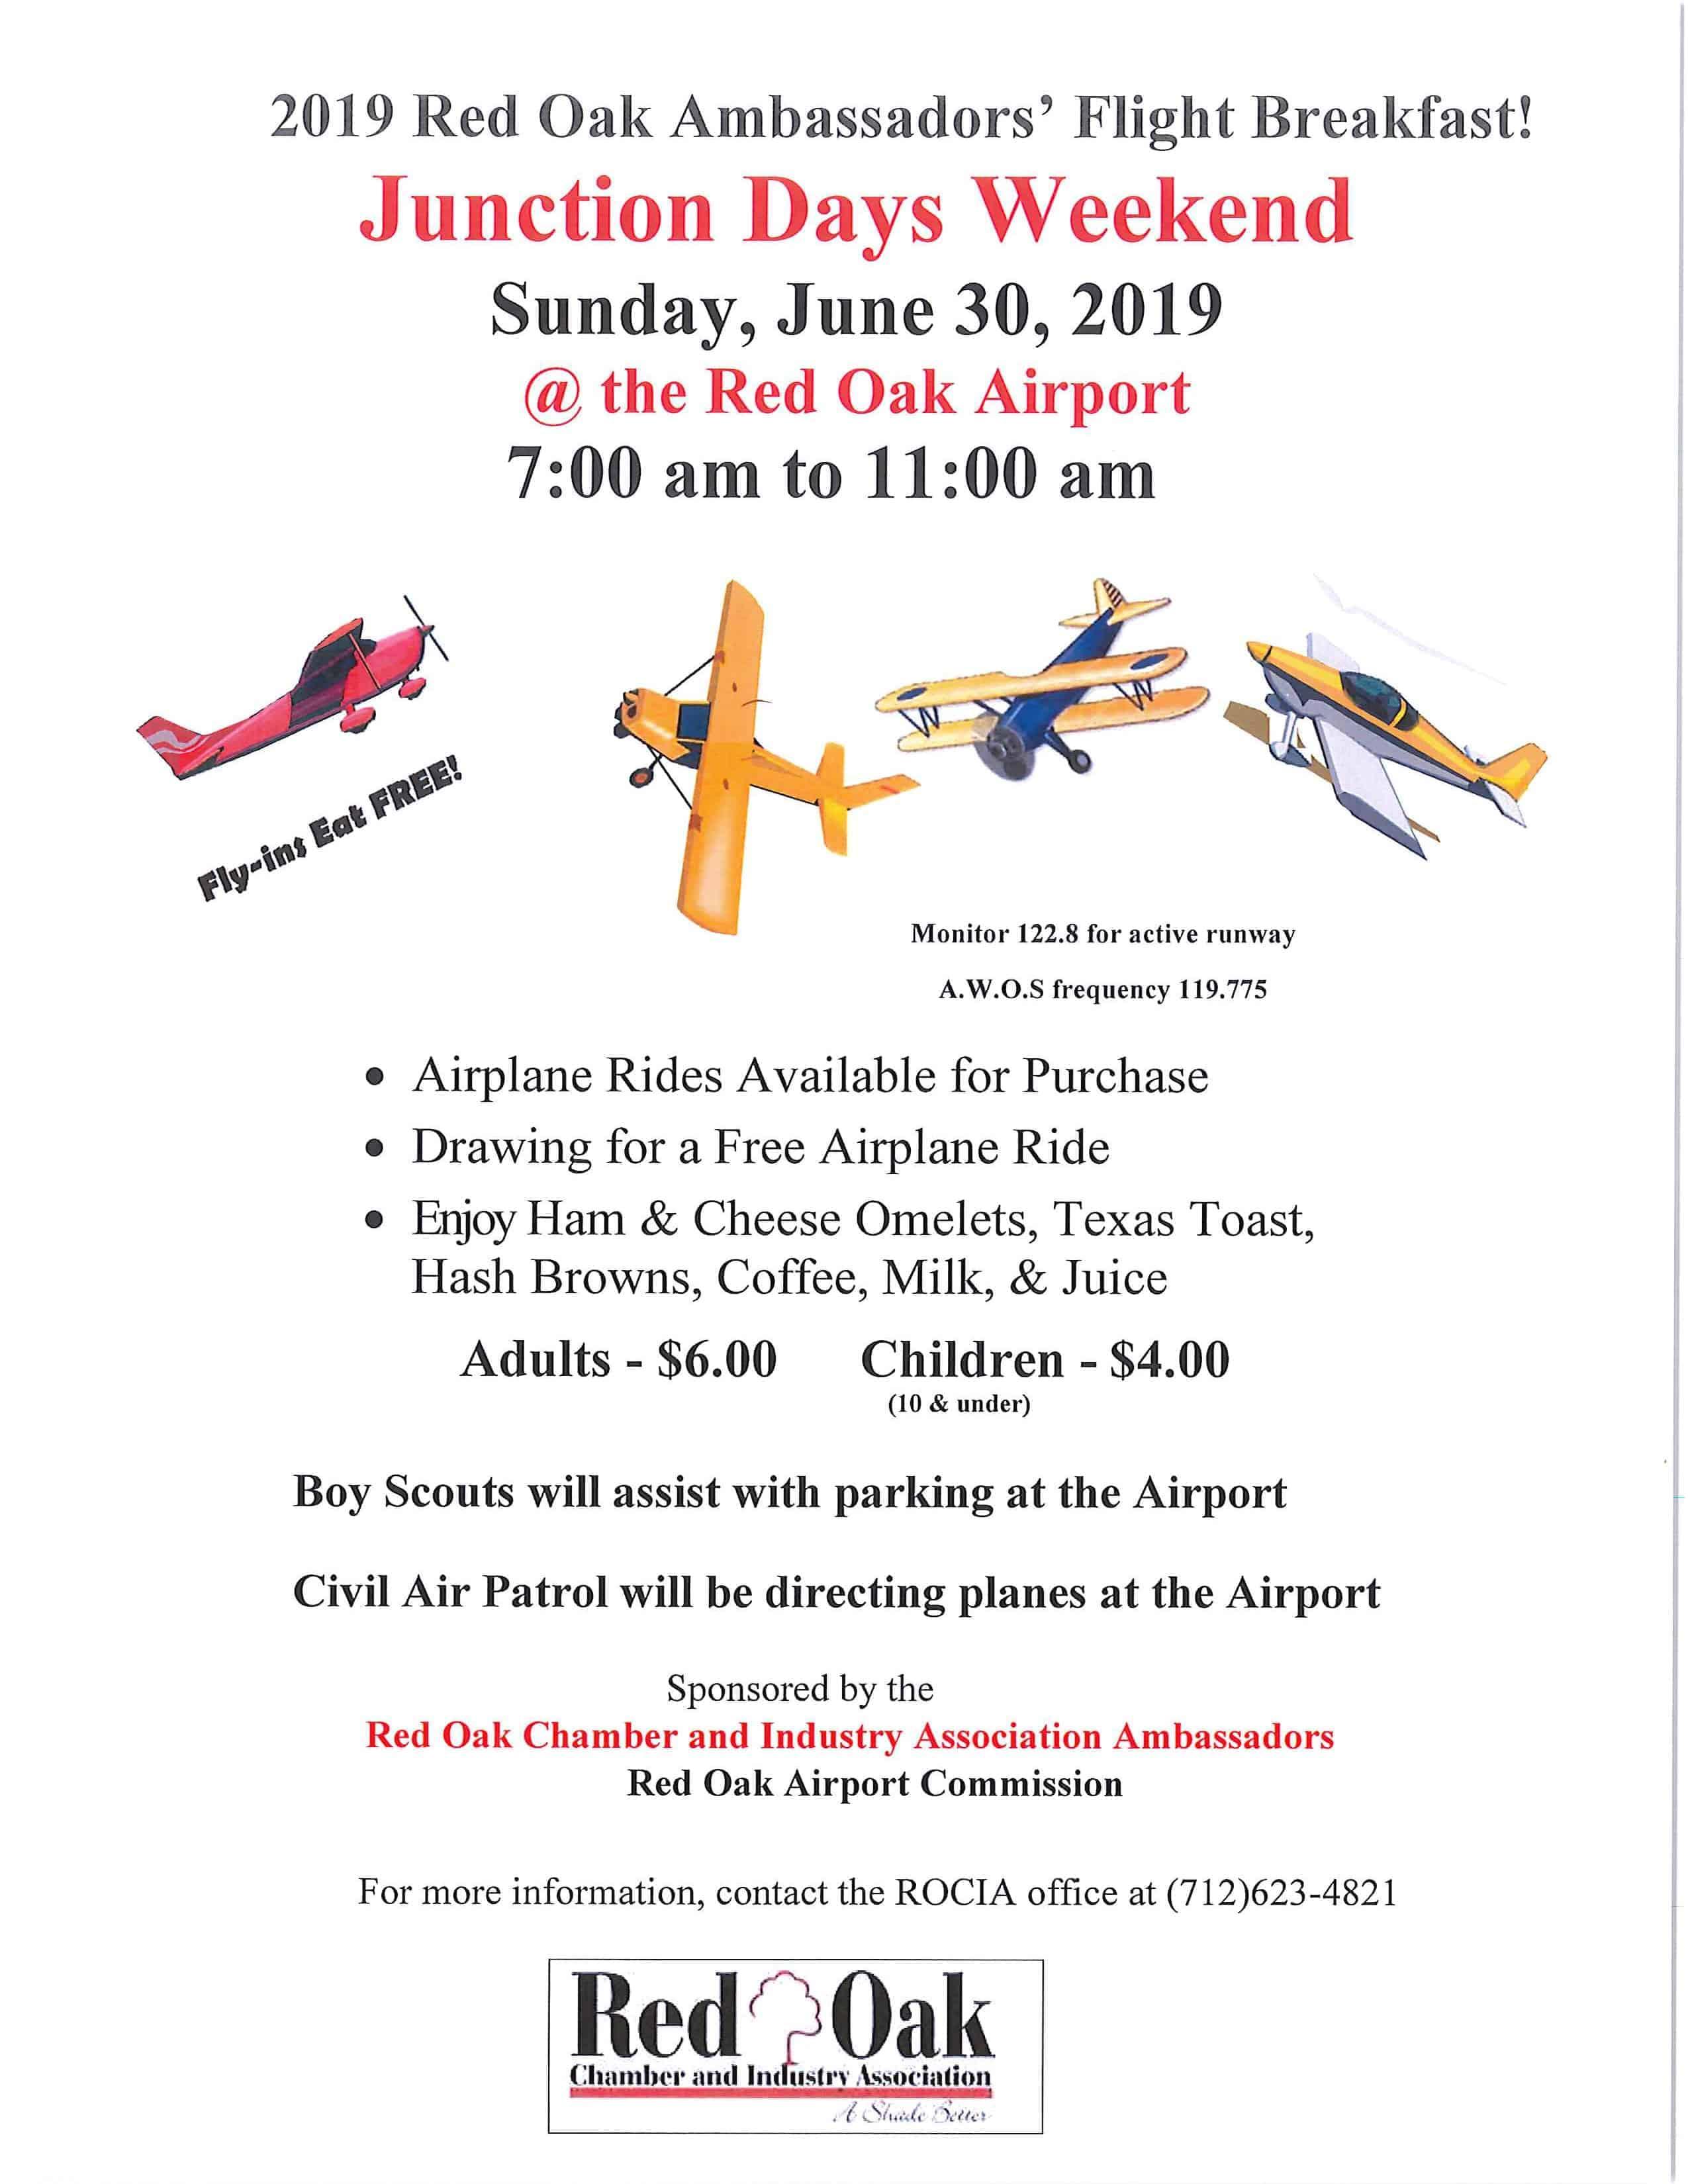 Red Oak Ambassadors' Flight Breakfast (Junction Days 2019